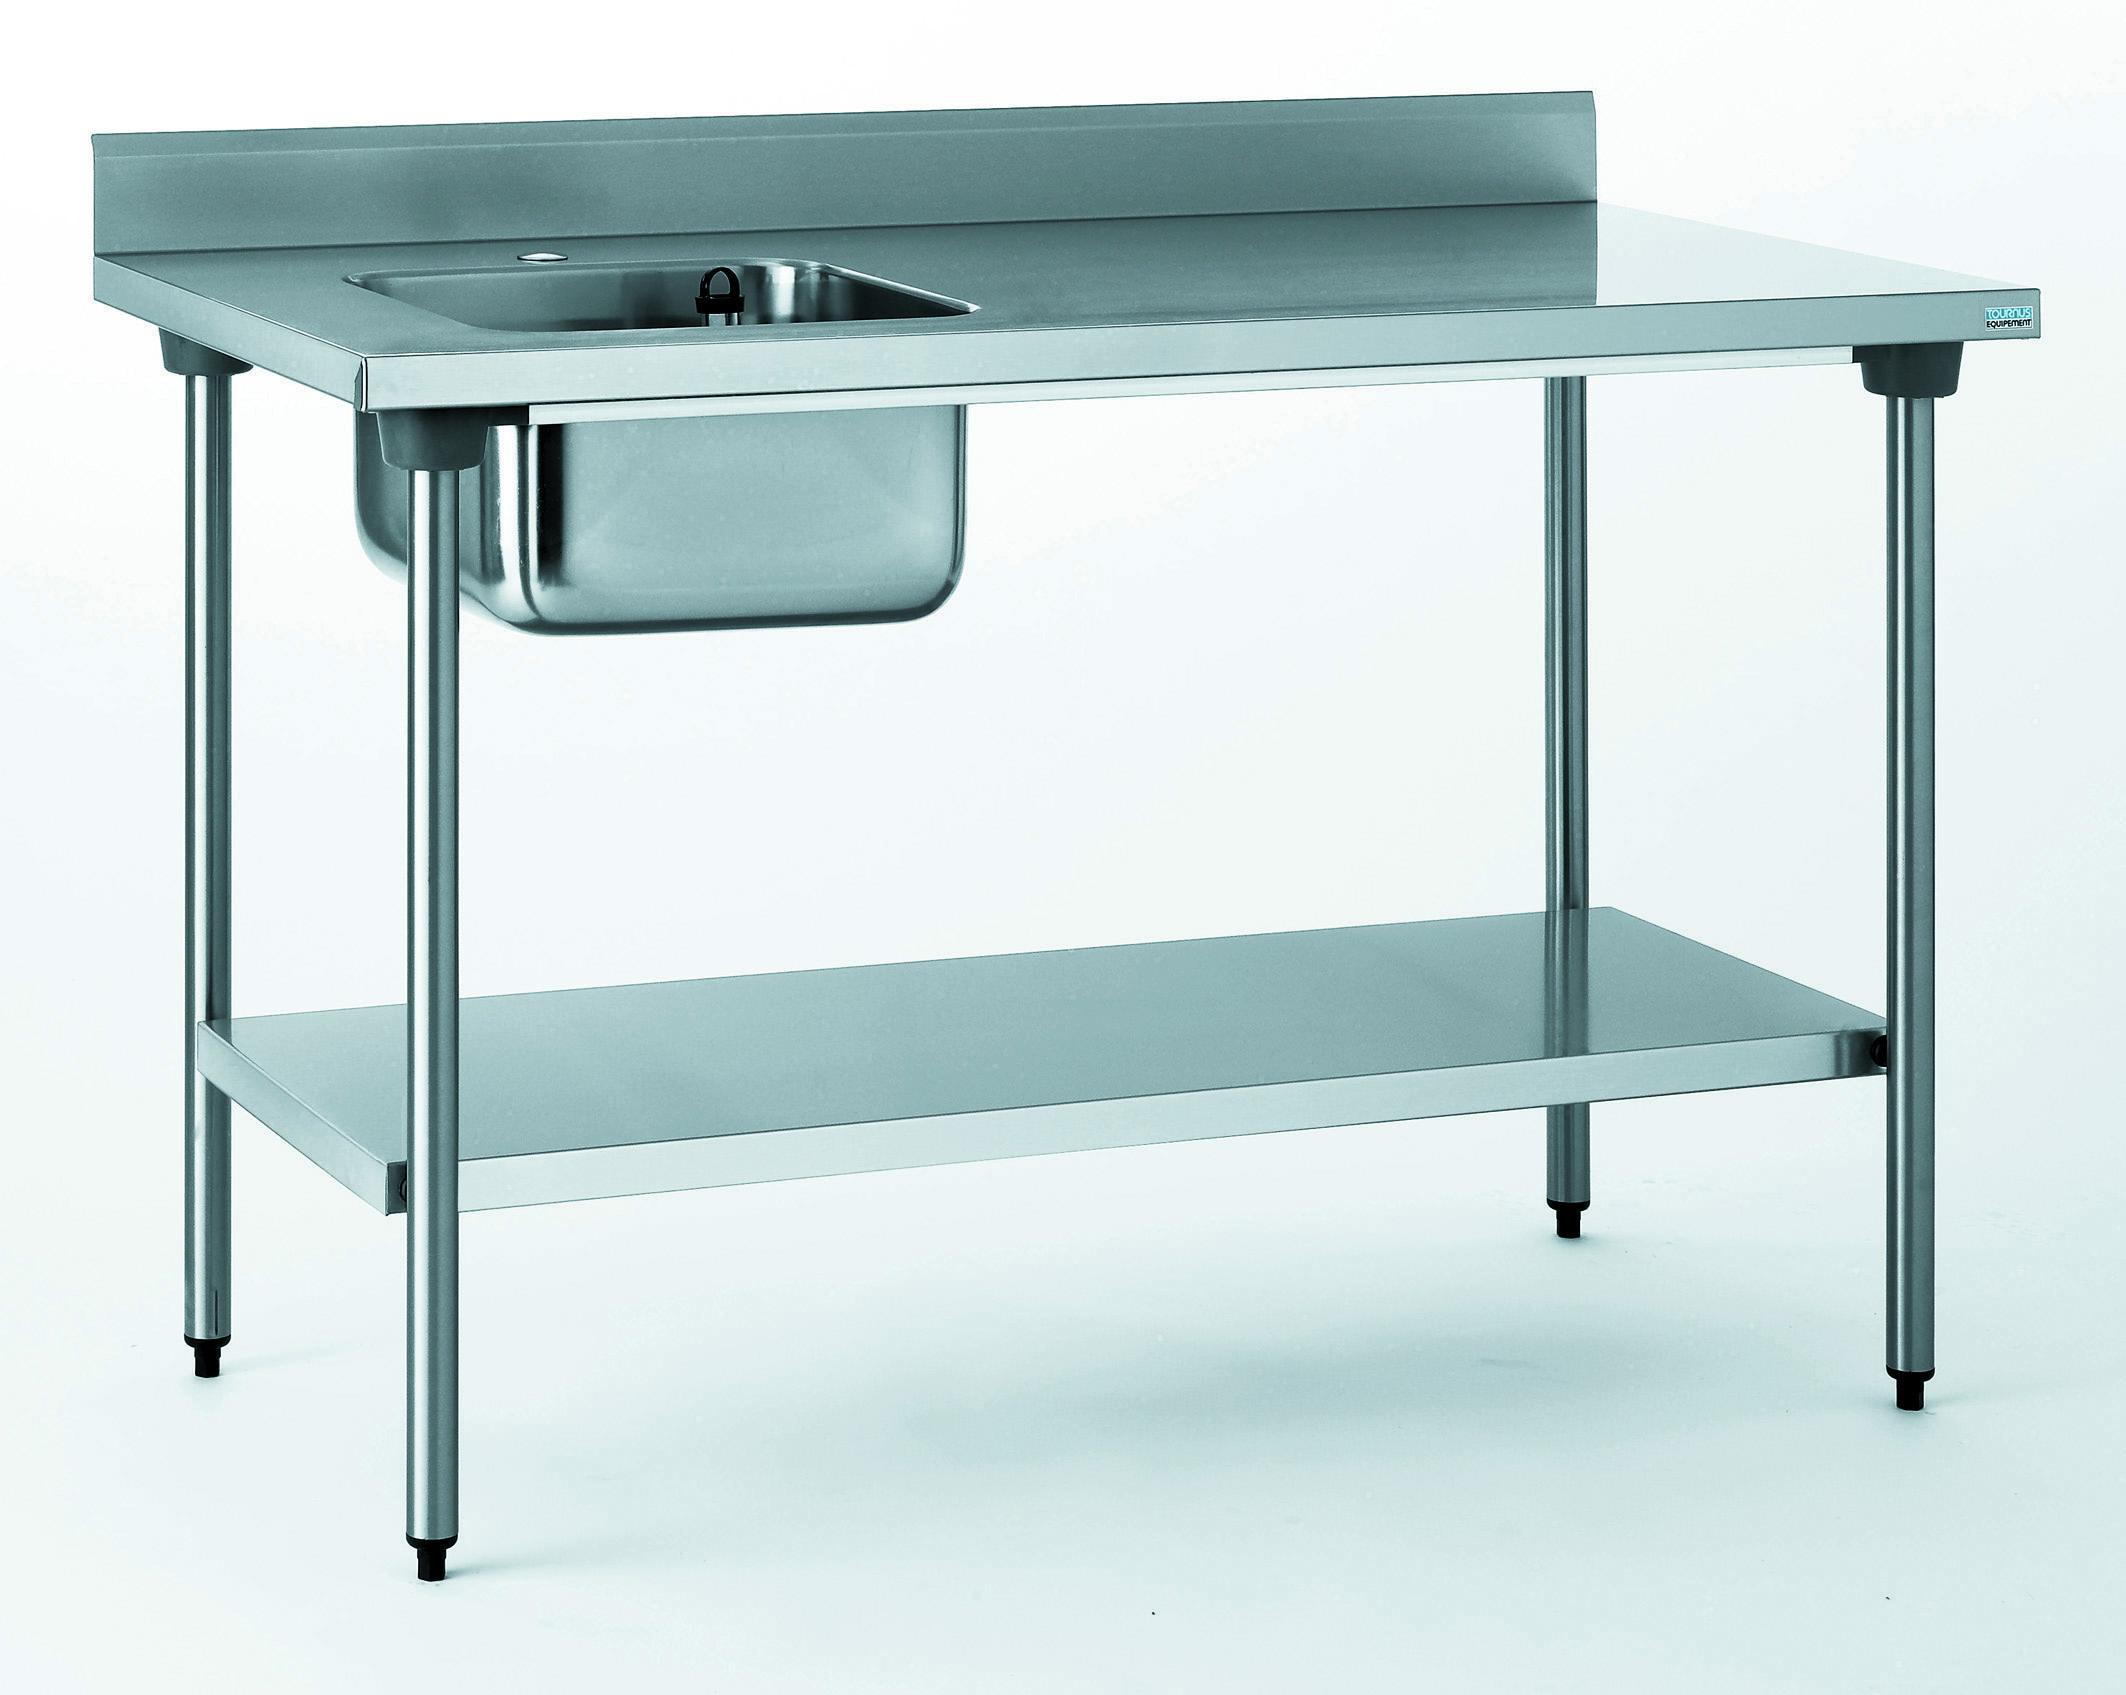 TABLE DU CHEF CHR 700X1400 BAC A GAUCHE+ETAGERE- SANS ROBINE